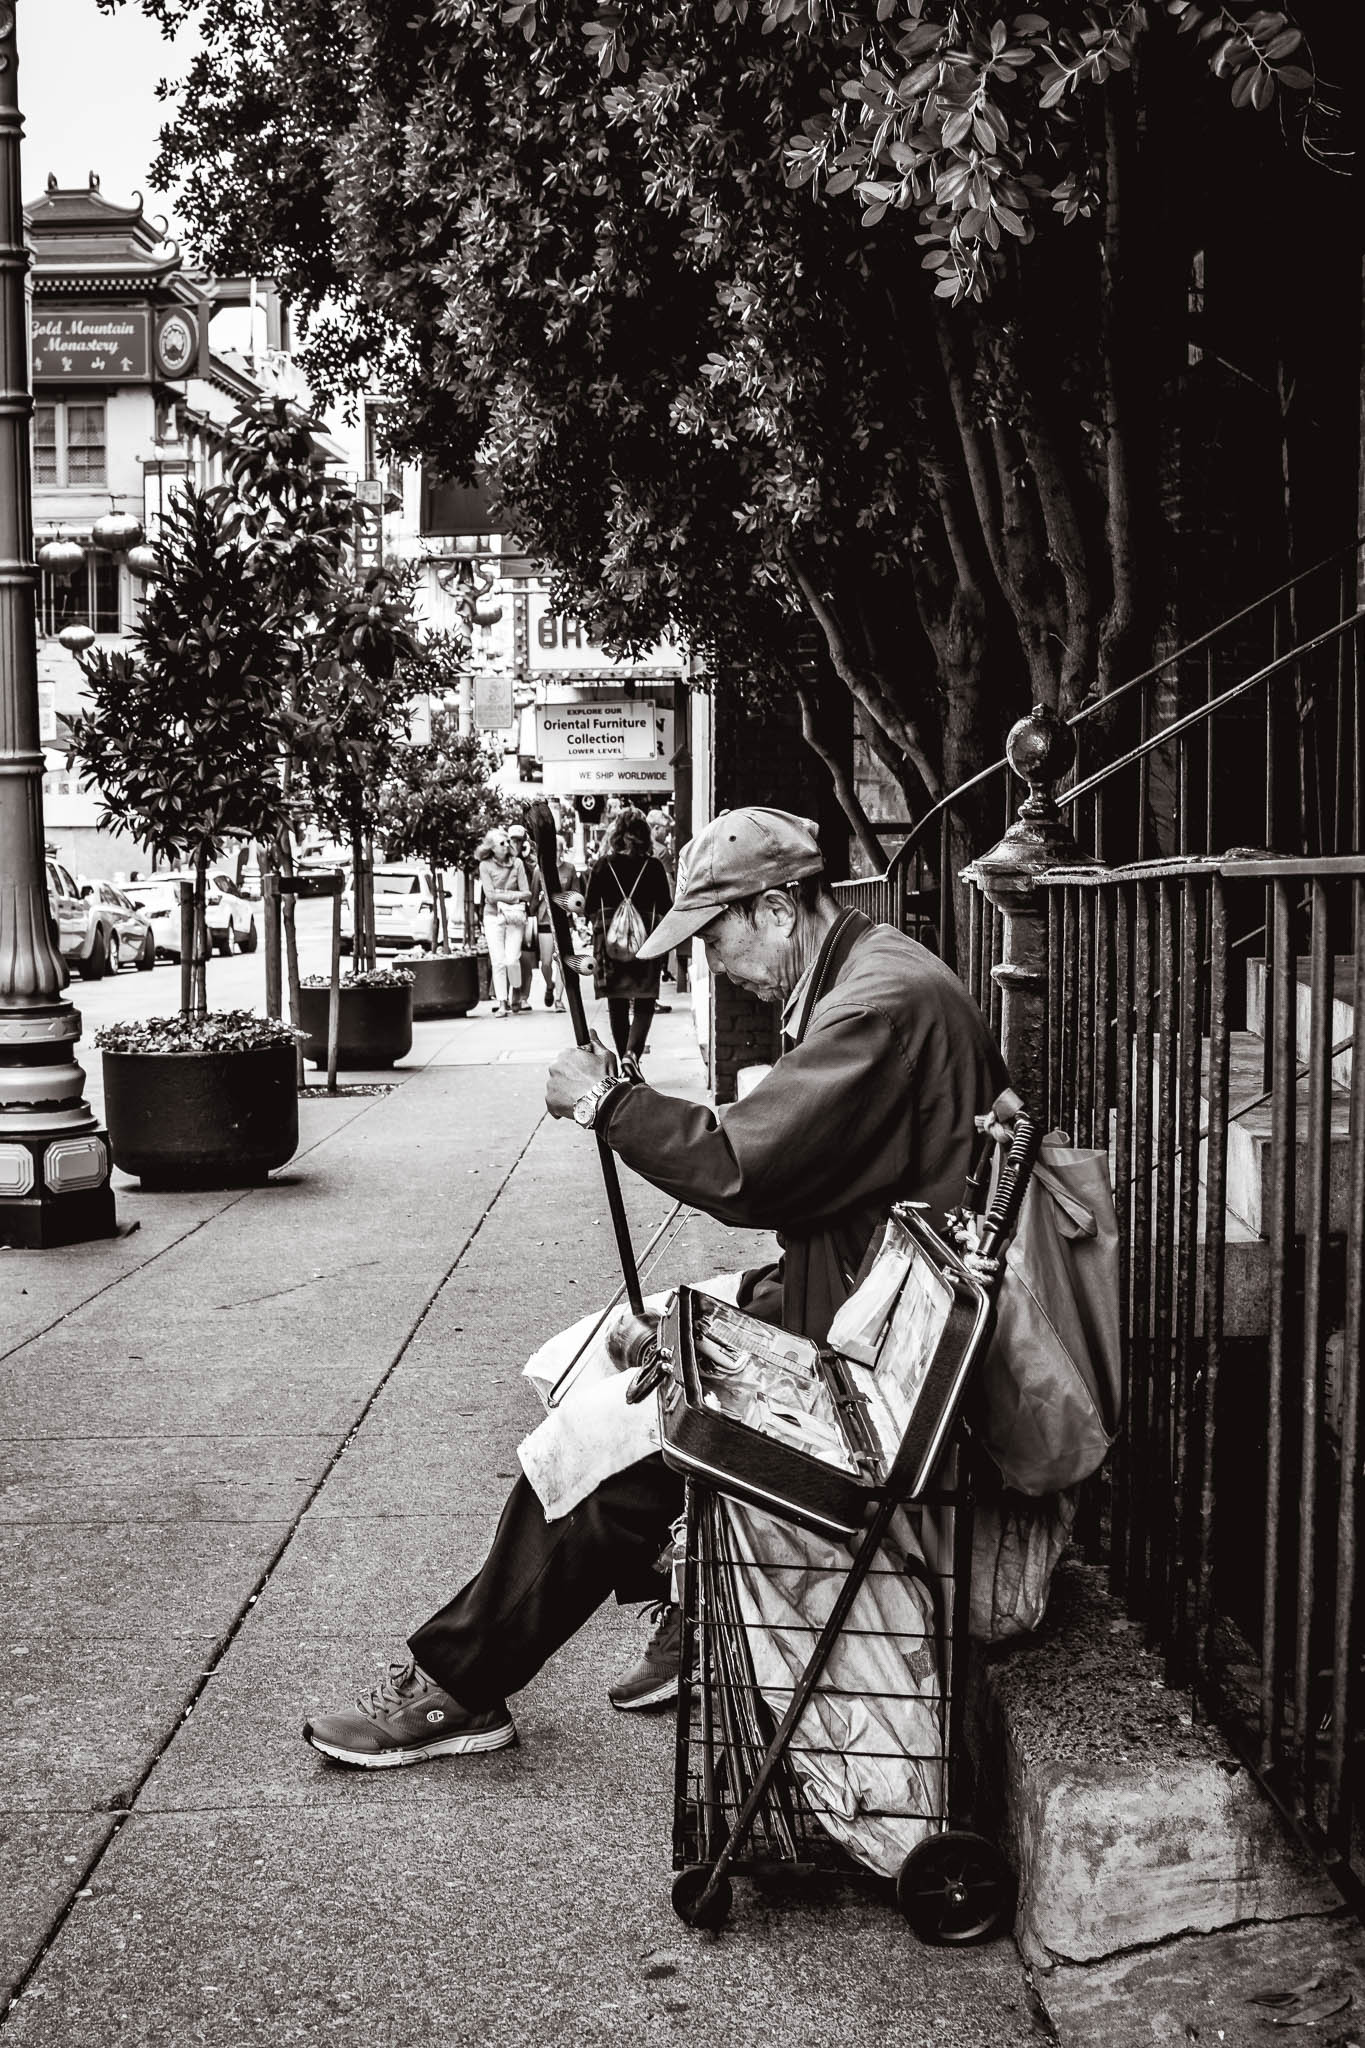 Street musician playing the Erhu